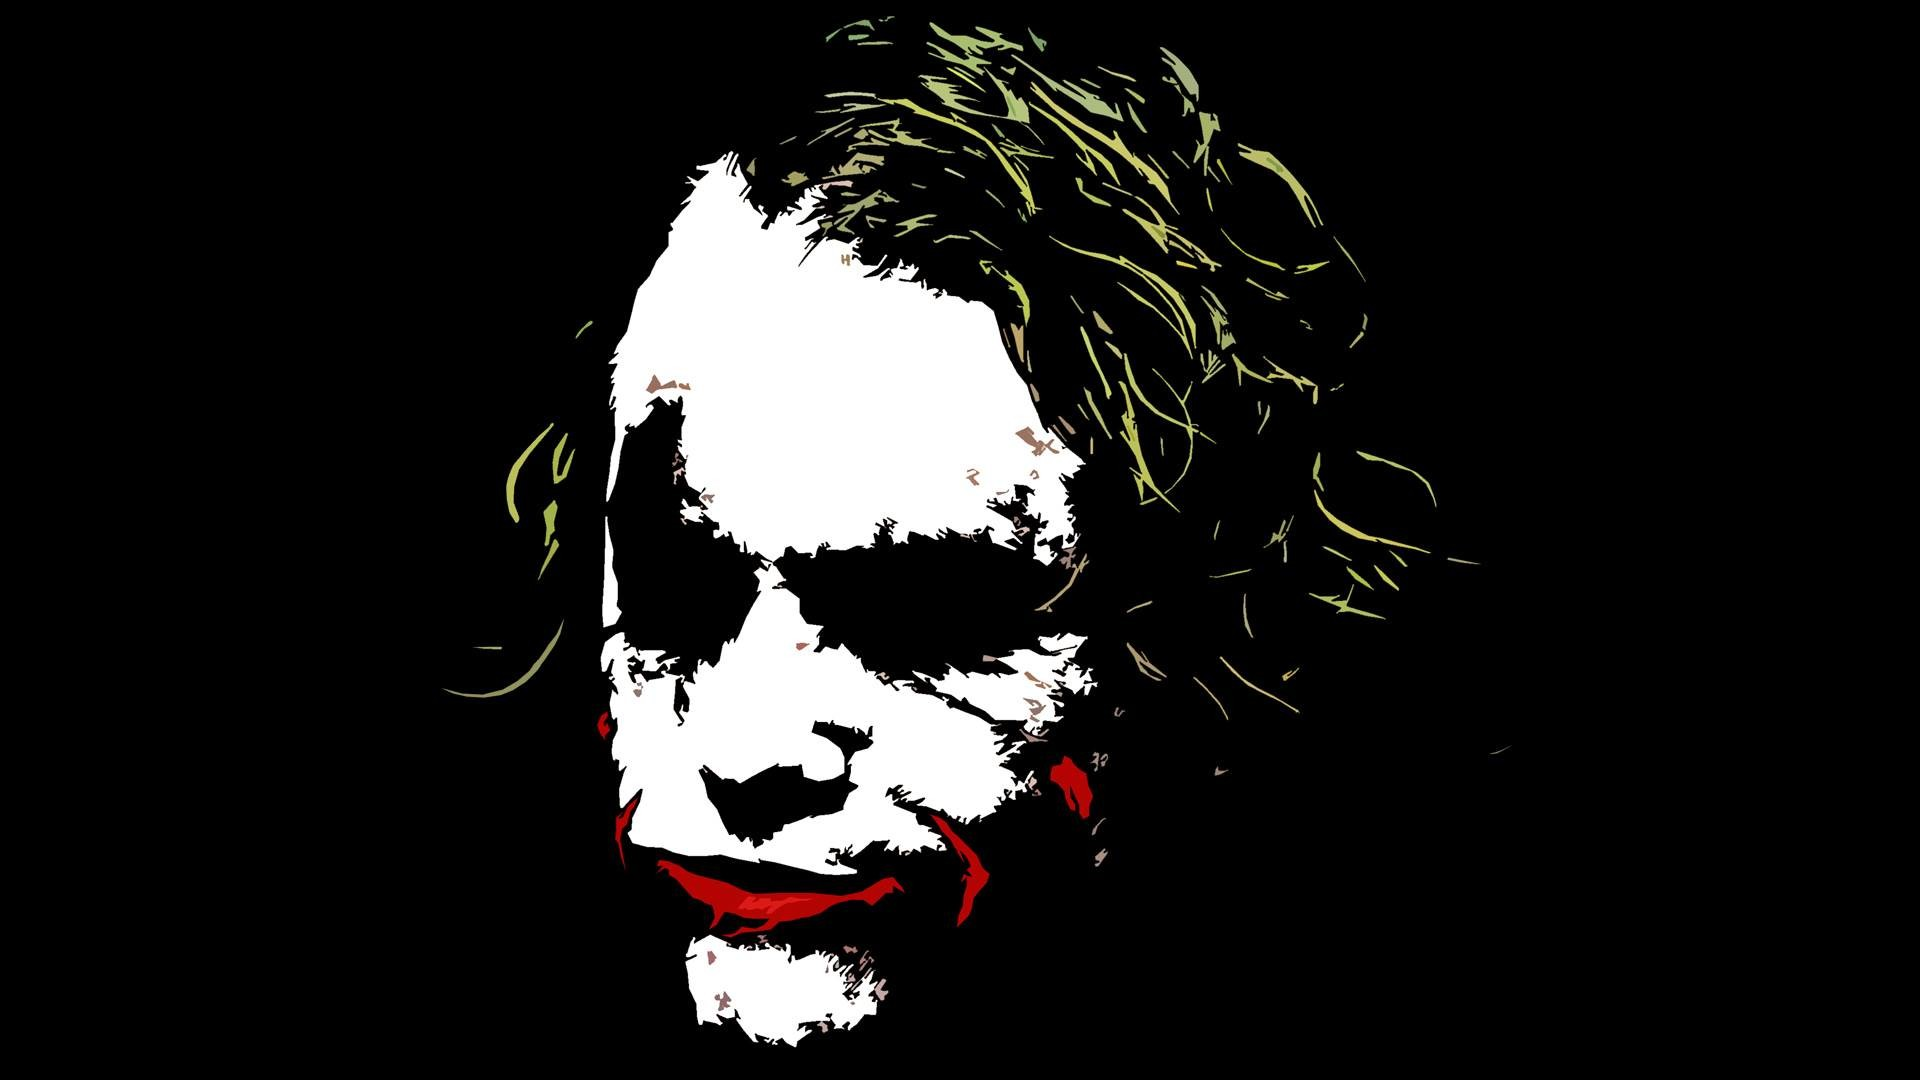 Joker HD Wallpapers Backgrounds Wallpaper 1920×1080 Joker Images   Adorable  Wallpapers